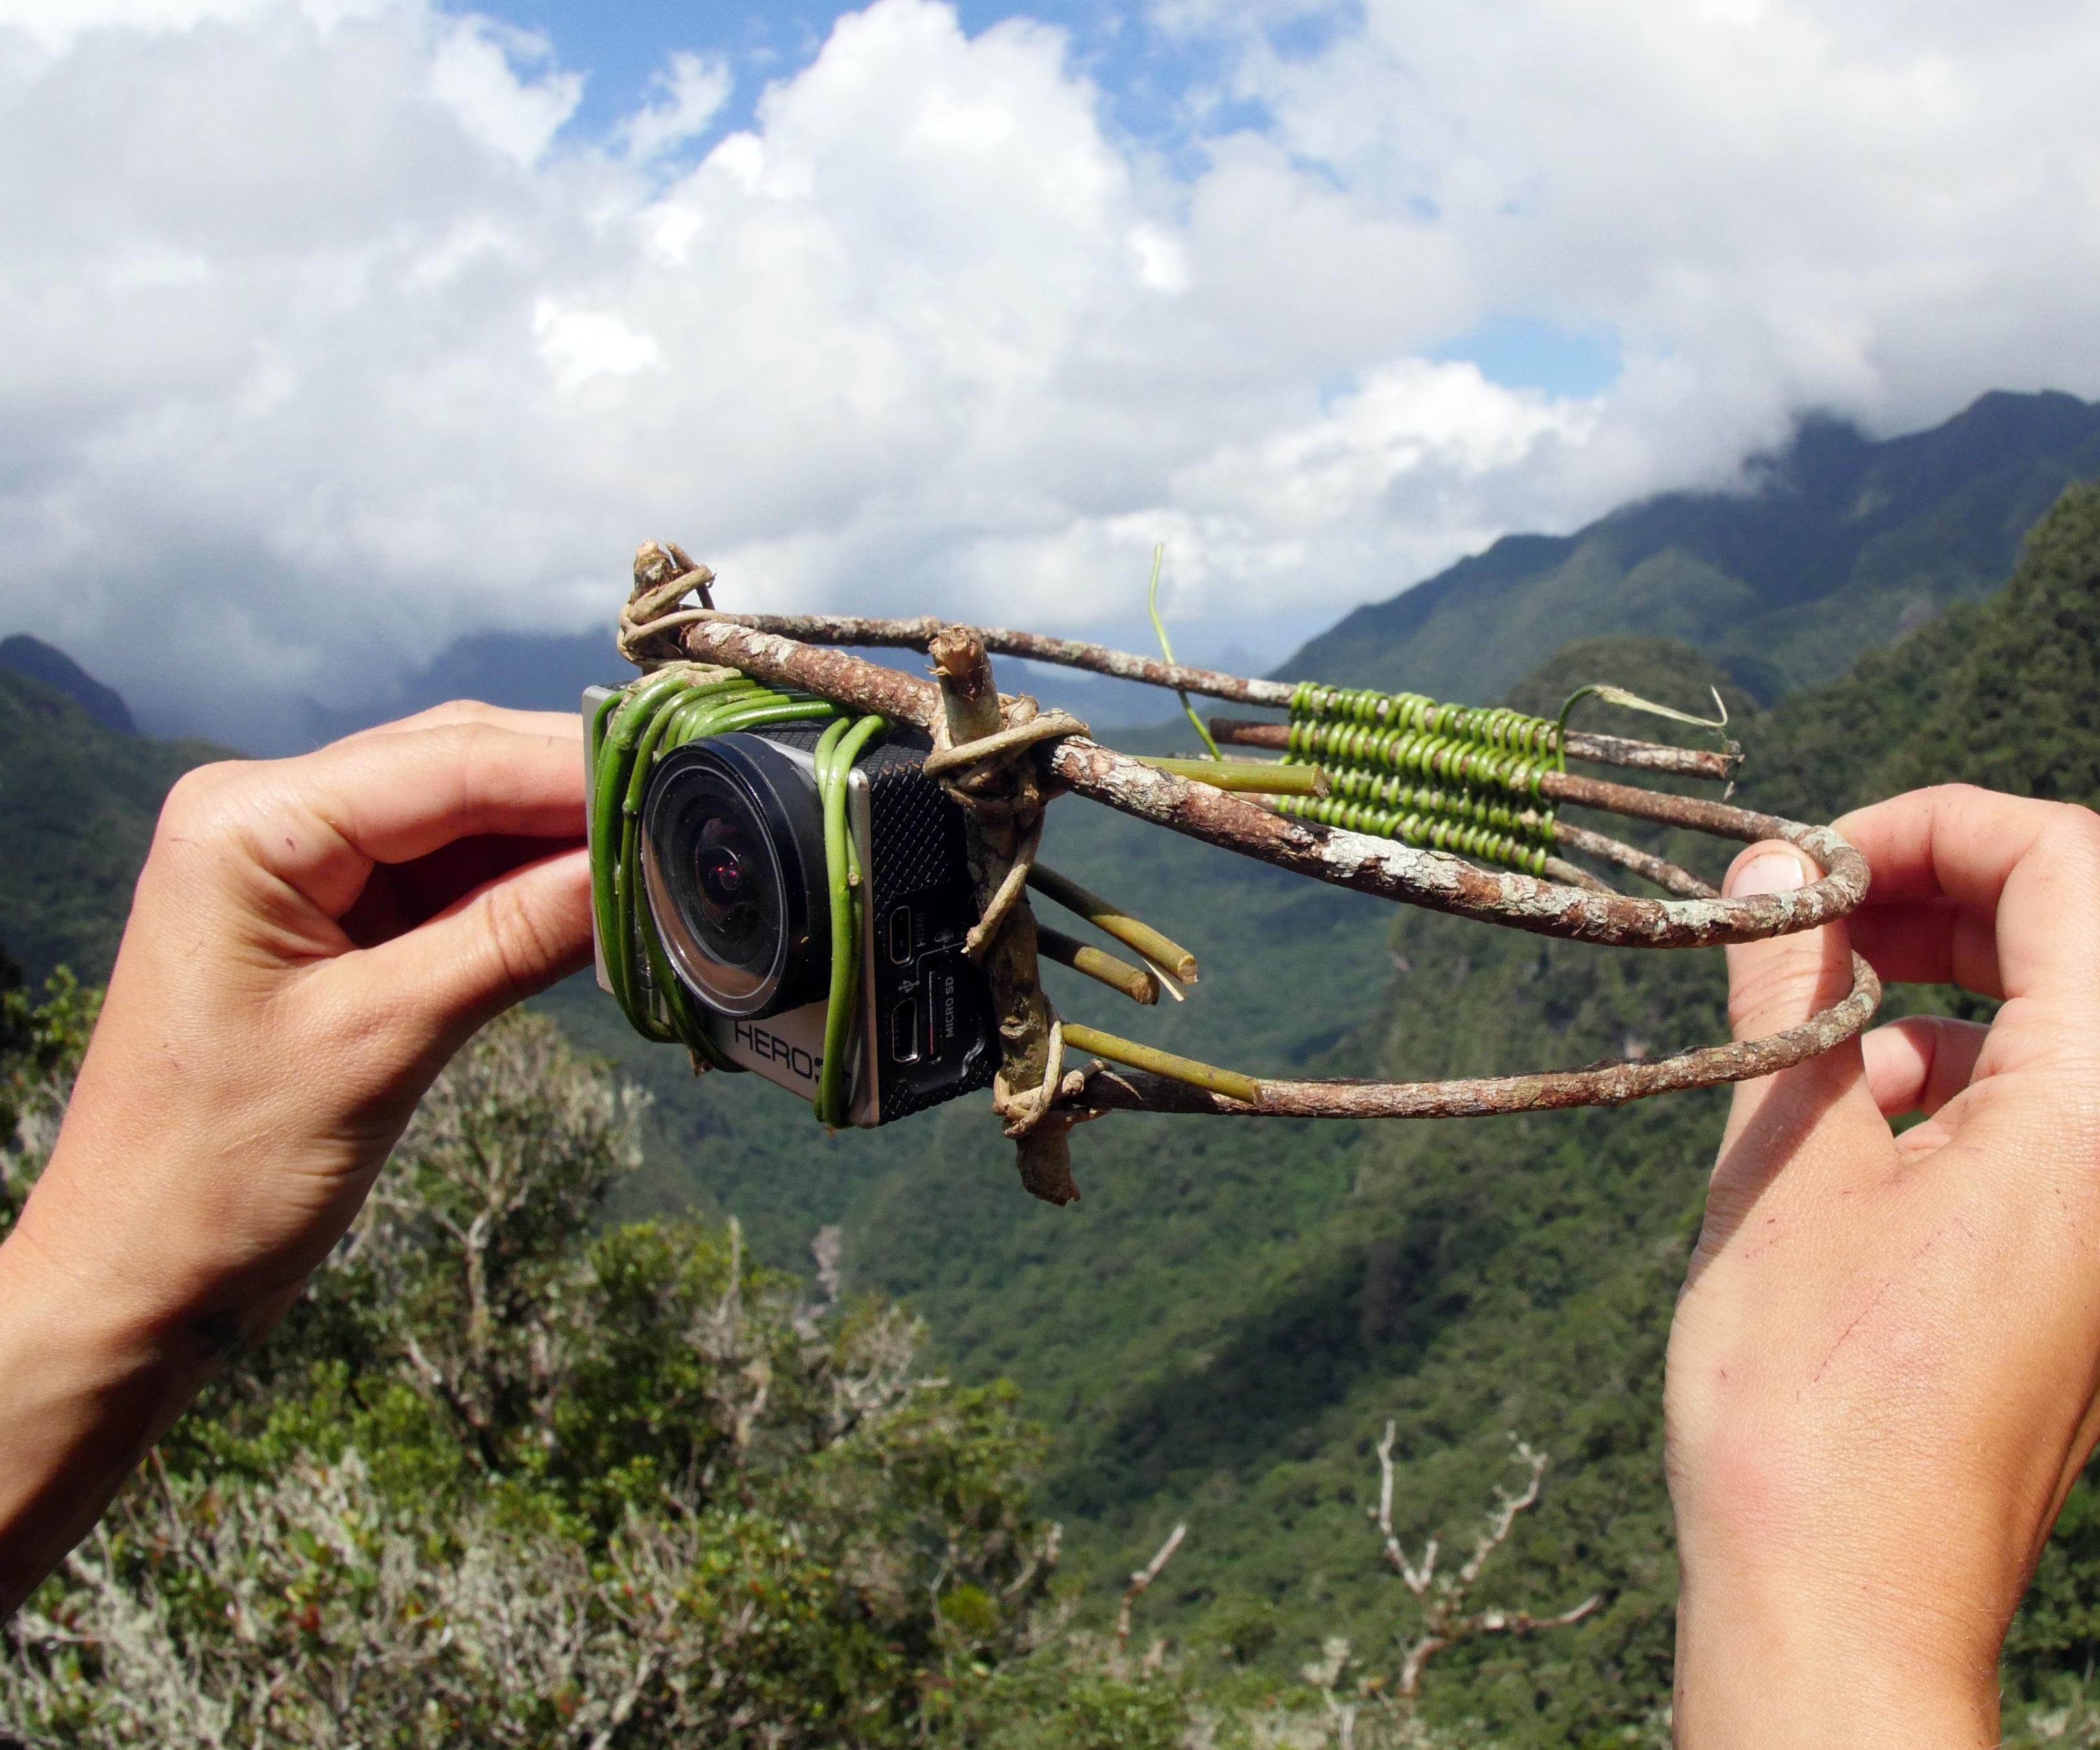 VinePro - Camera Head Mount